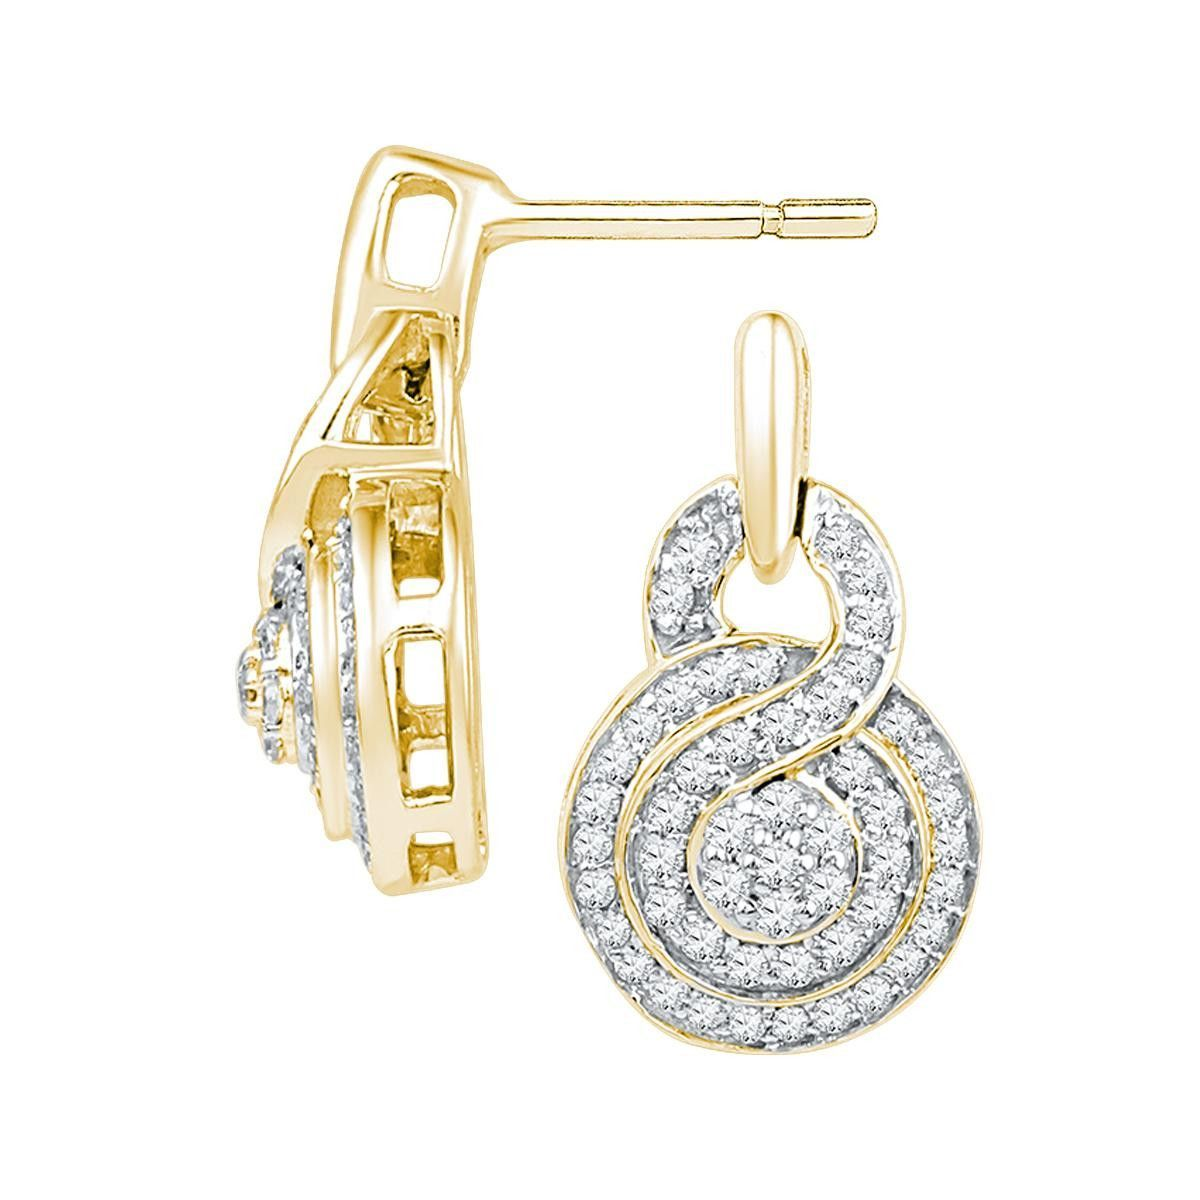 1-2CTW-Diamond FASHION EARRING